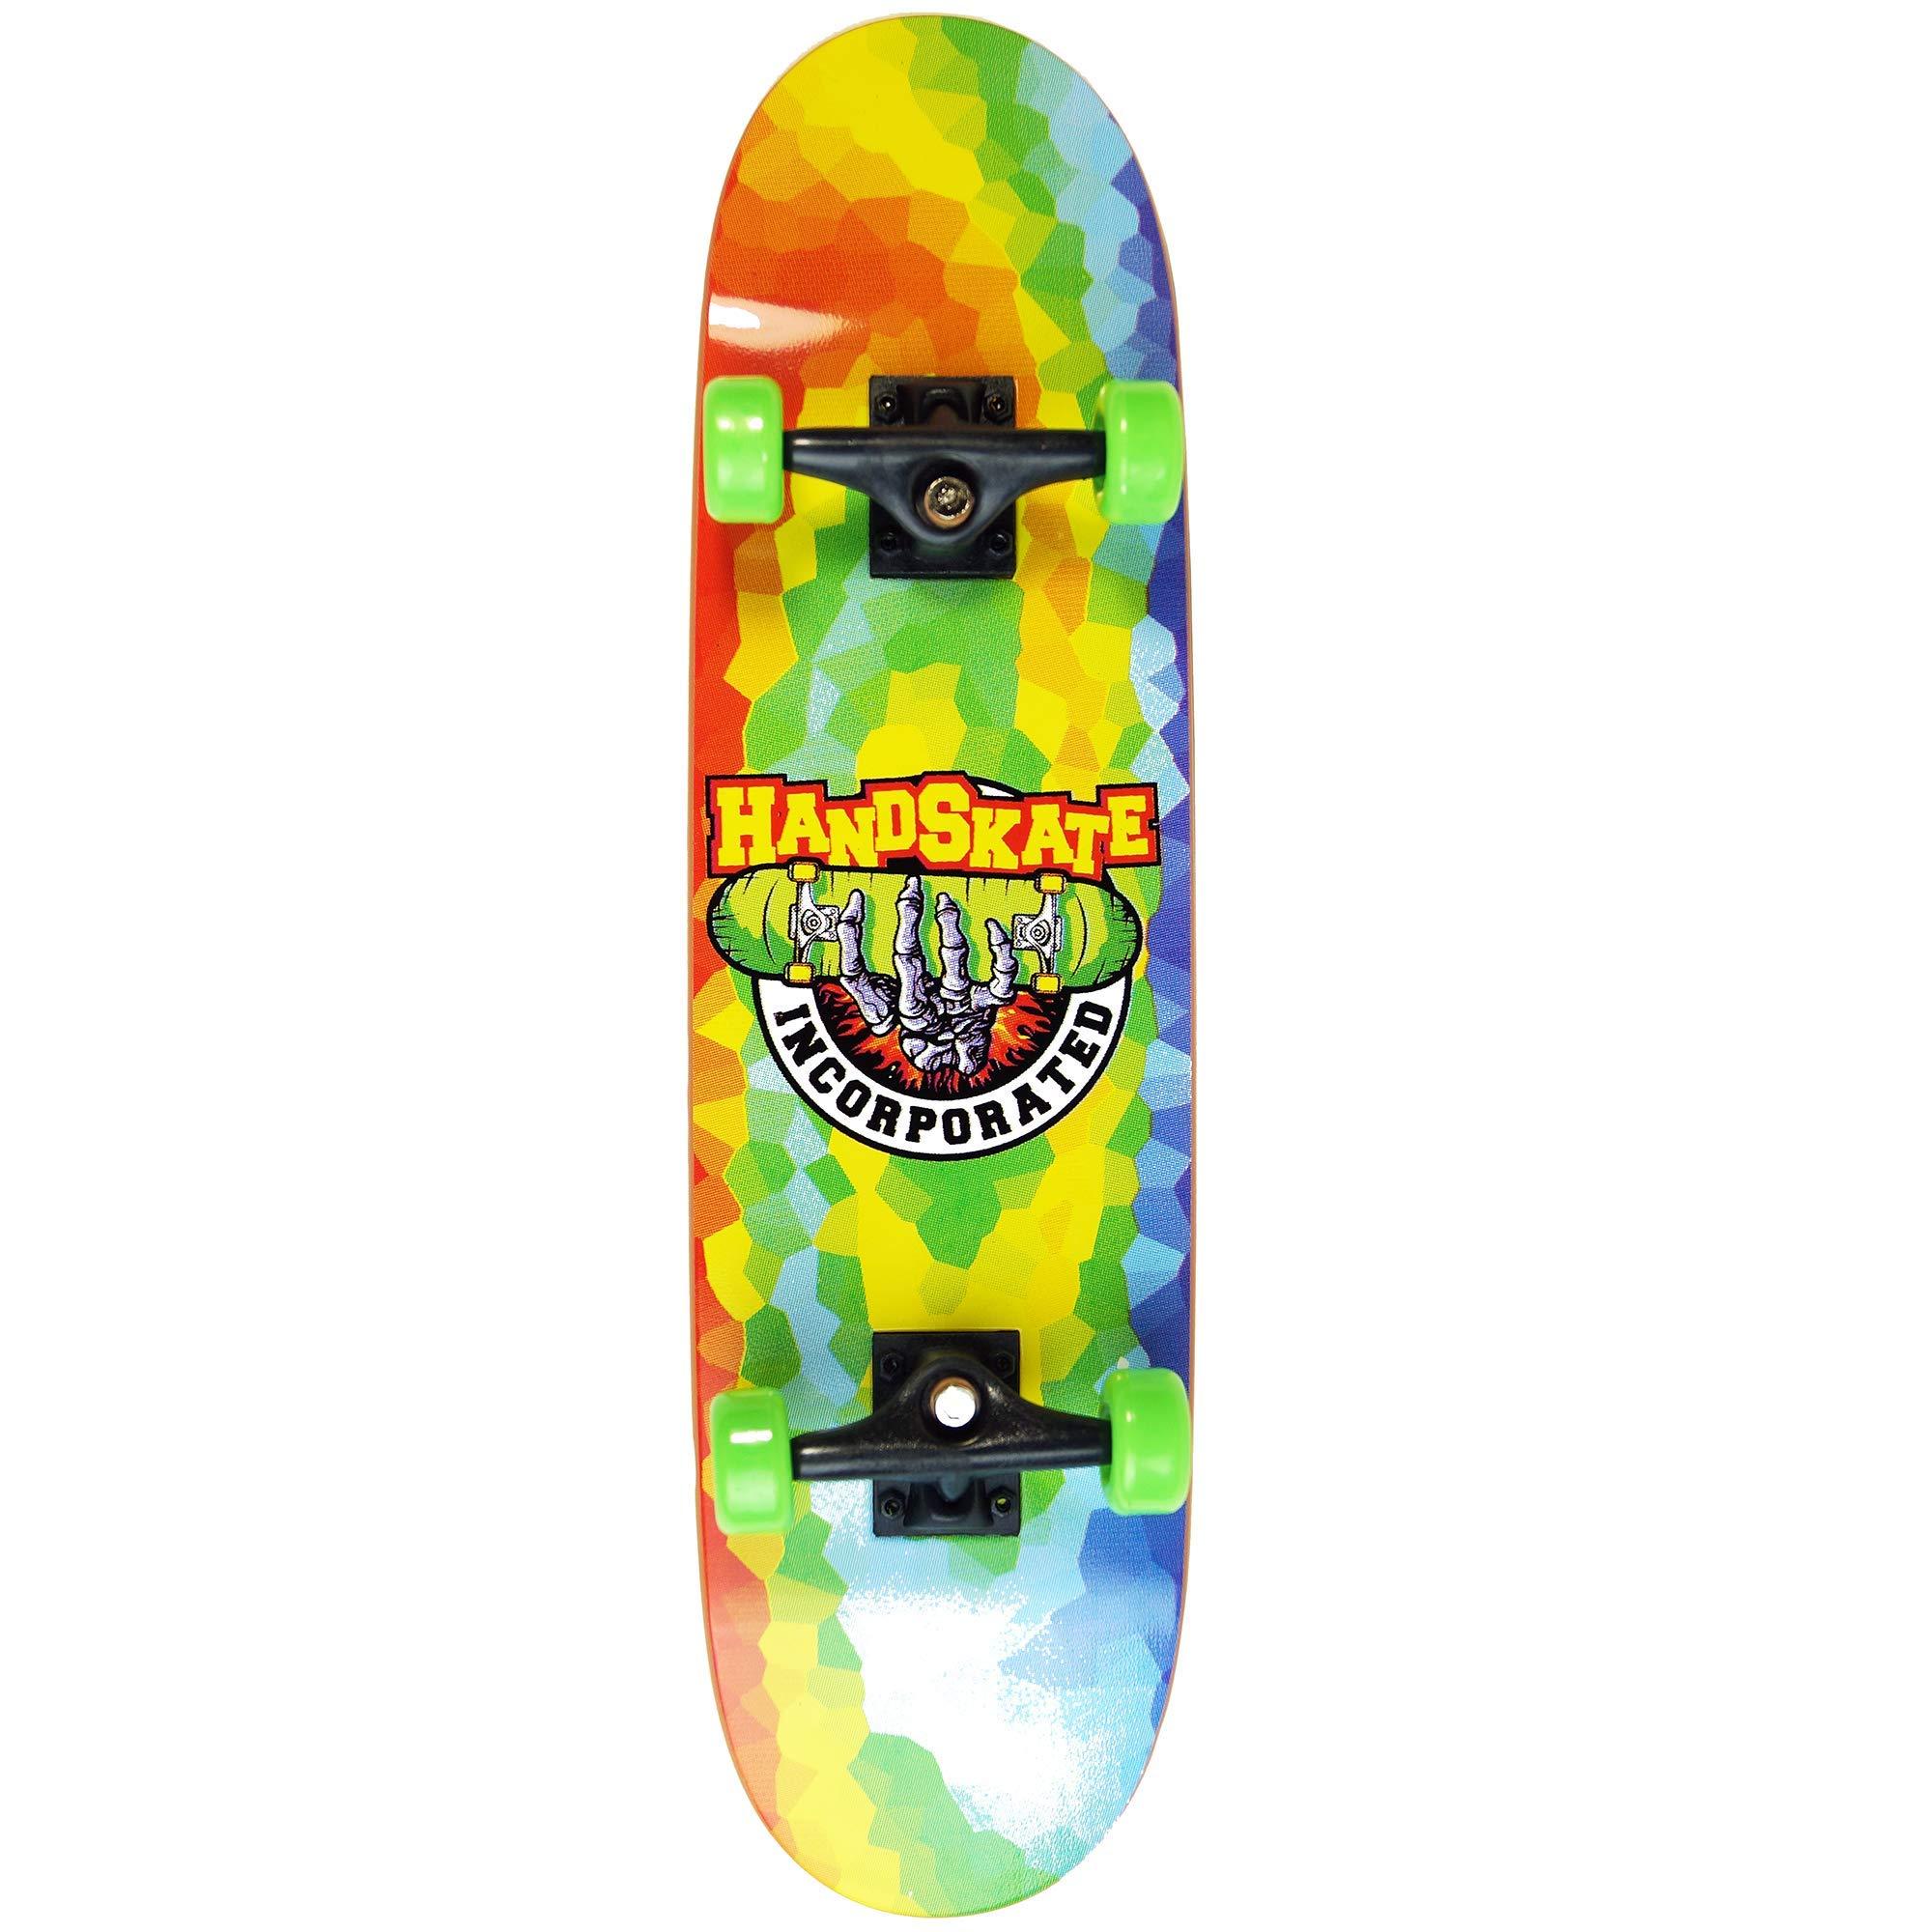 HandSkate Handboard (Swirlicious)